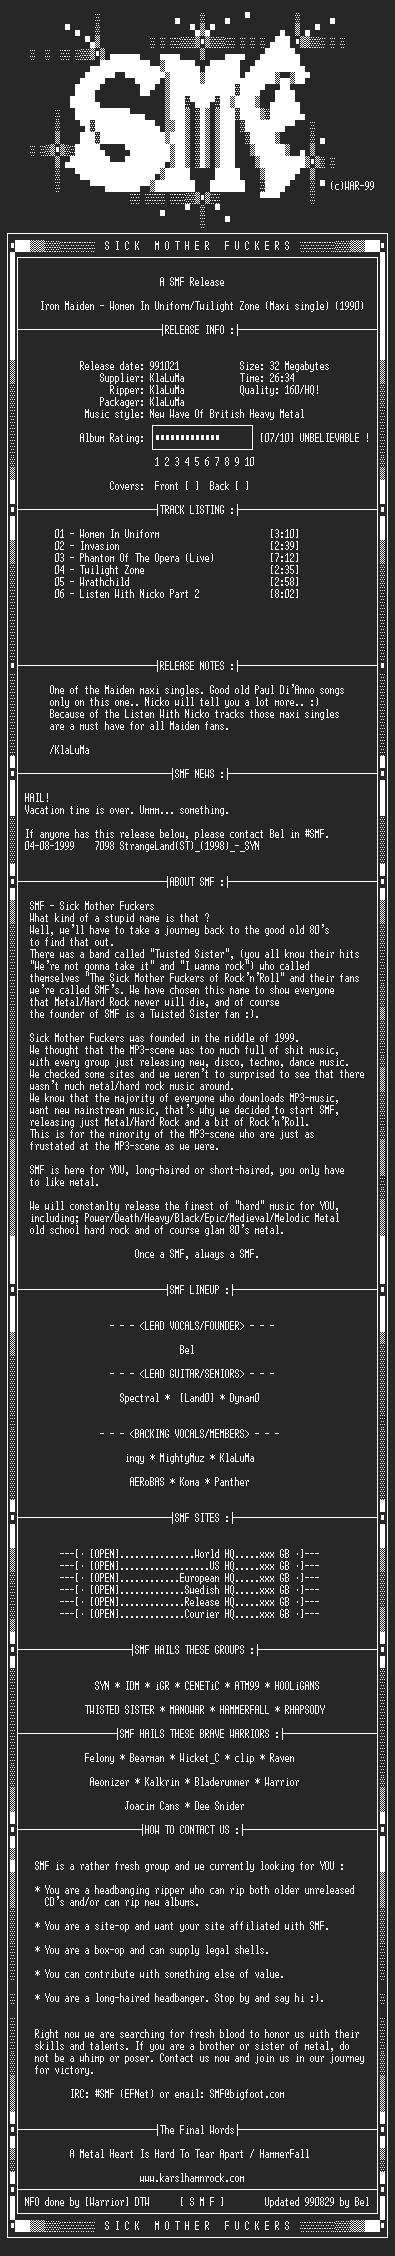 NFO file for Iron_Maiden-Women_In_Uniform_(Maxi_Single)_(1990)-SMF